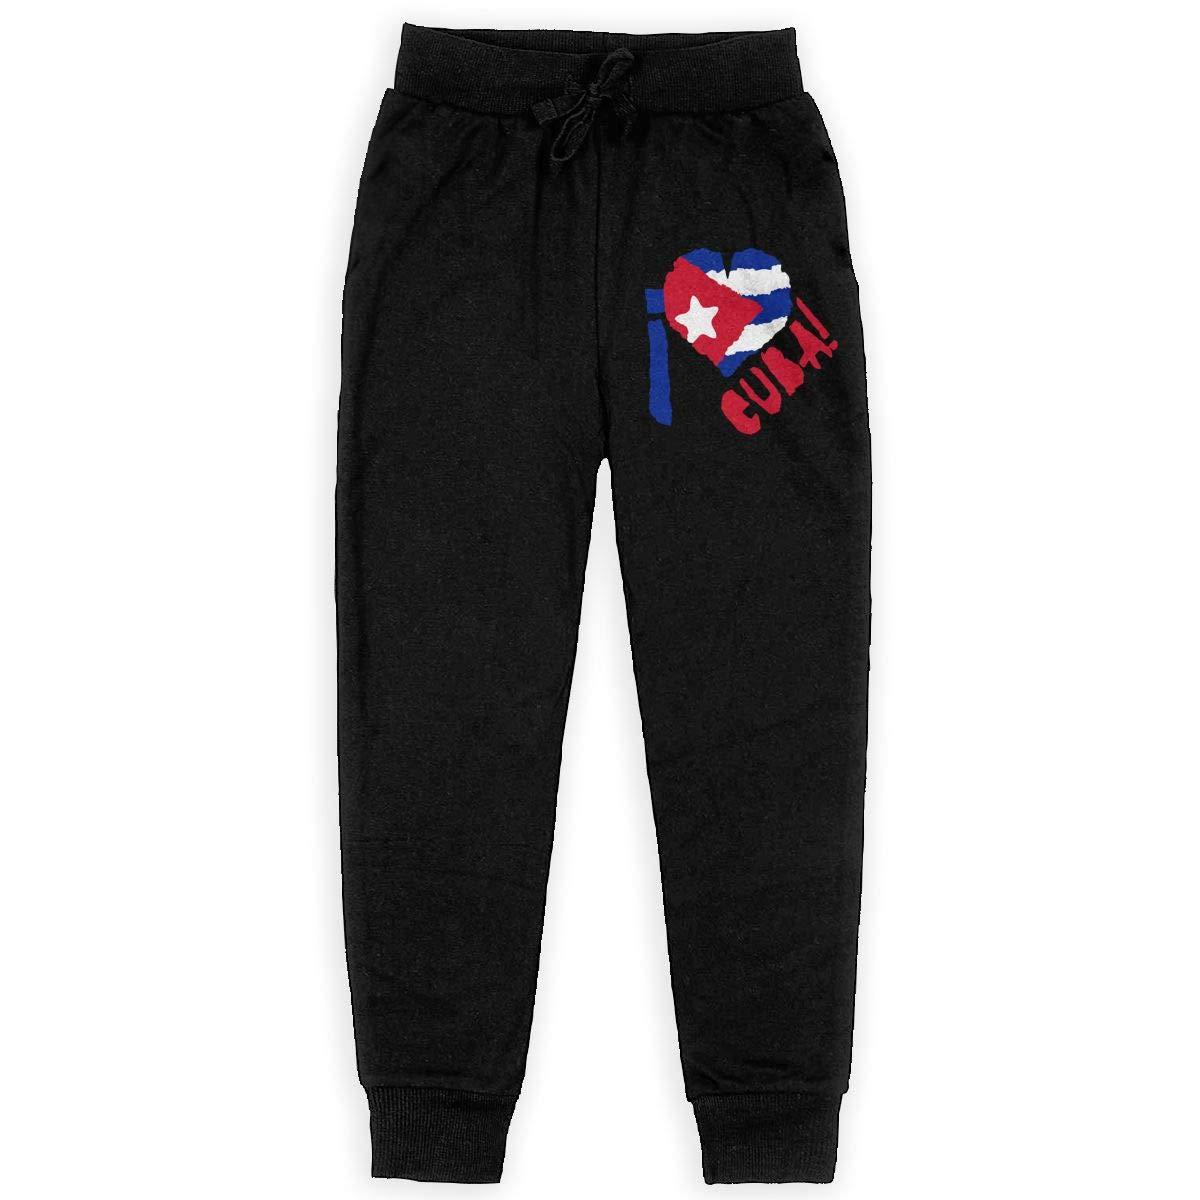 I Love Cuba Soft//Cozy Sweatpants Girls Active Basic Jogger Fleece Pants for Teen Boy